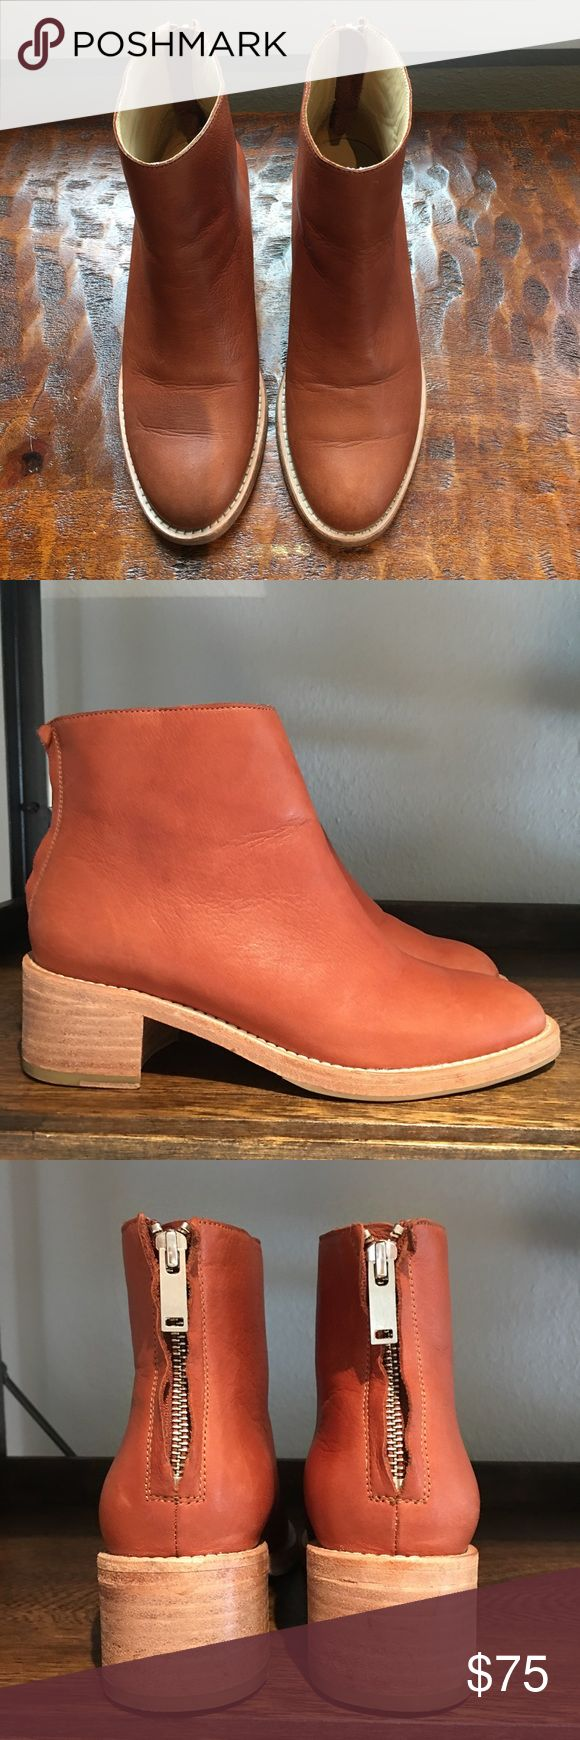 COS Booties Cognac back zip booties in excellent condition.  Stacked low heel COS Shoes Ankle Boots & Booties